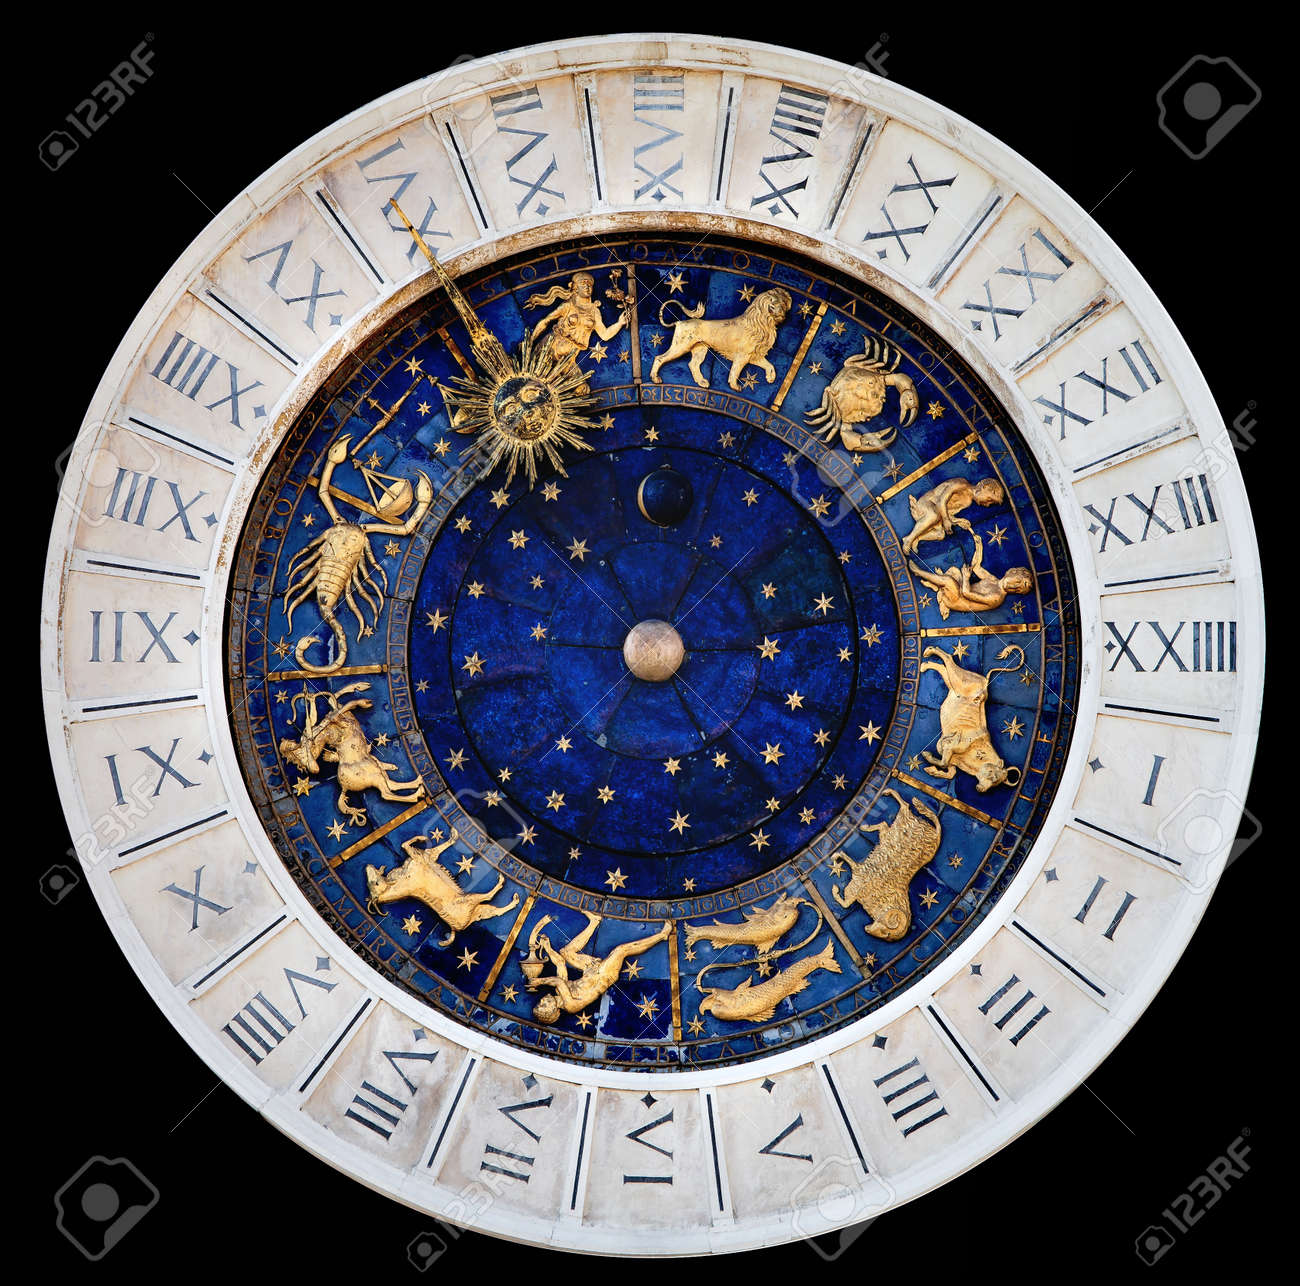 Zodiac Clock At San Marco Square In Venice Stock Photo, Picture And ...